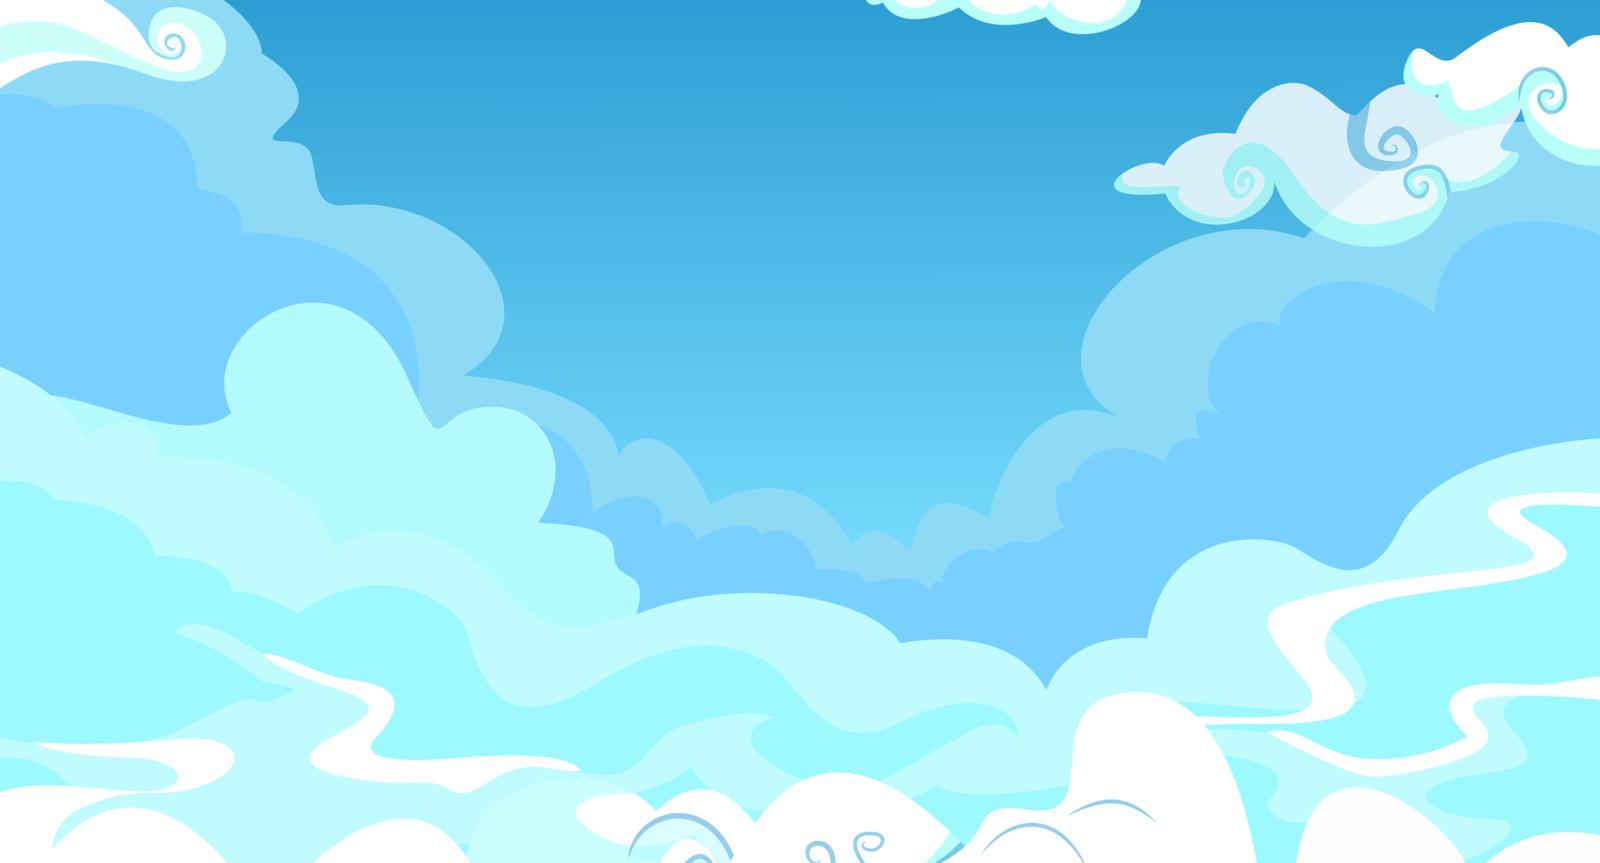 cloud clipart background - photo #9